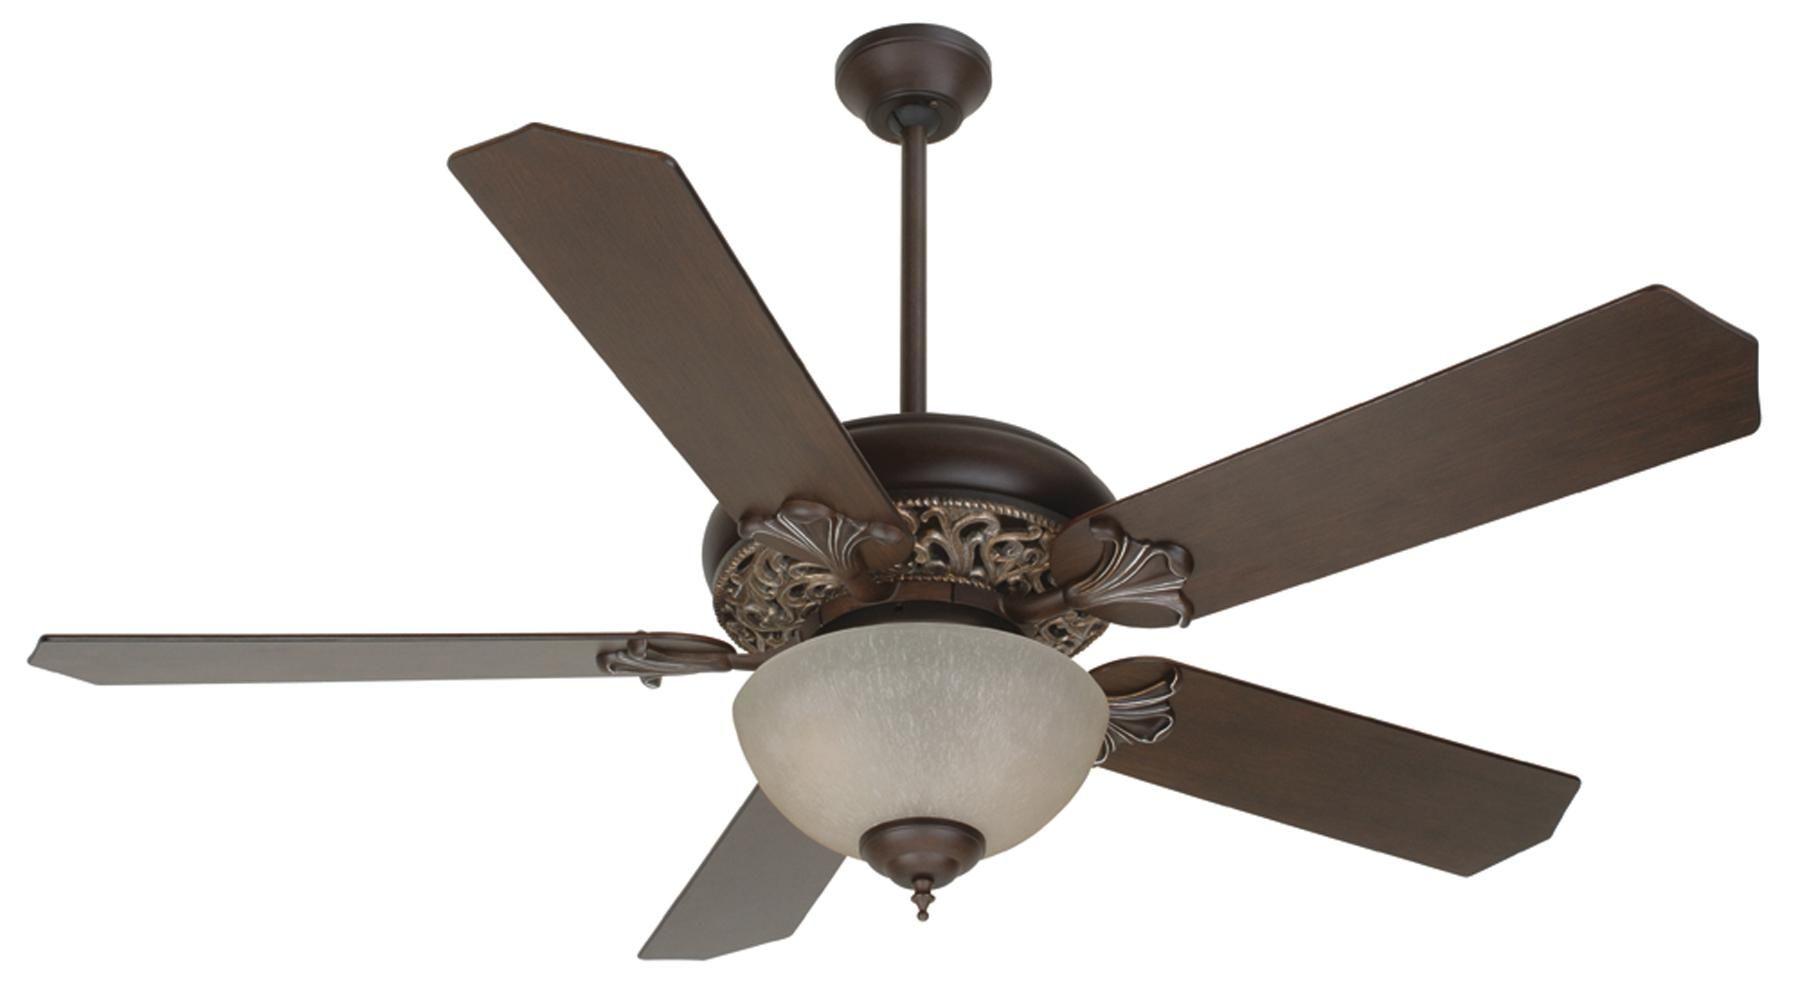 Take Down Remove Hampton Bay Ceiling Fan Ac 552 4 Light Unit With